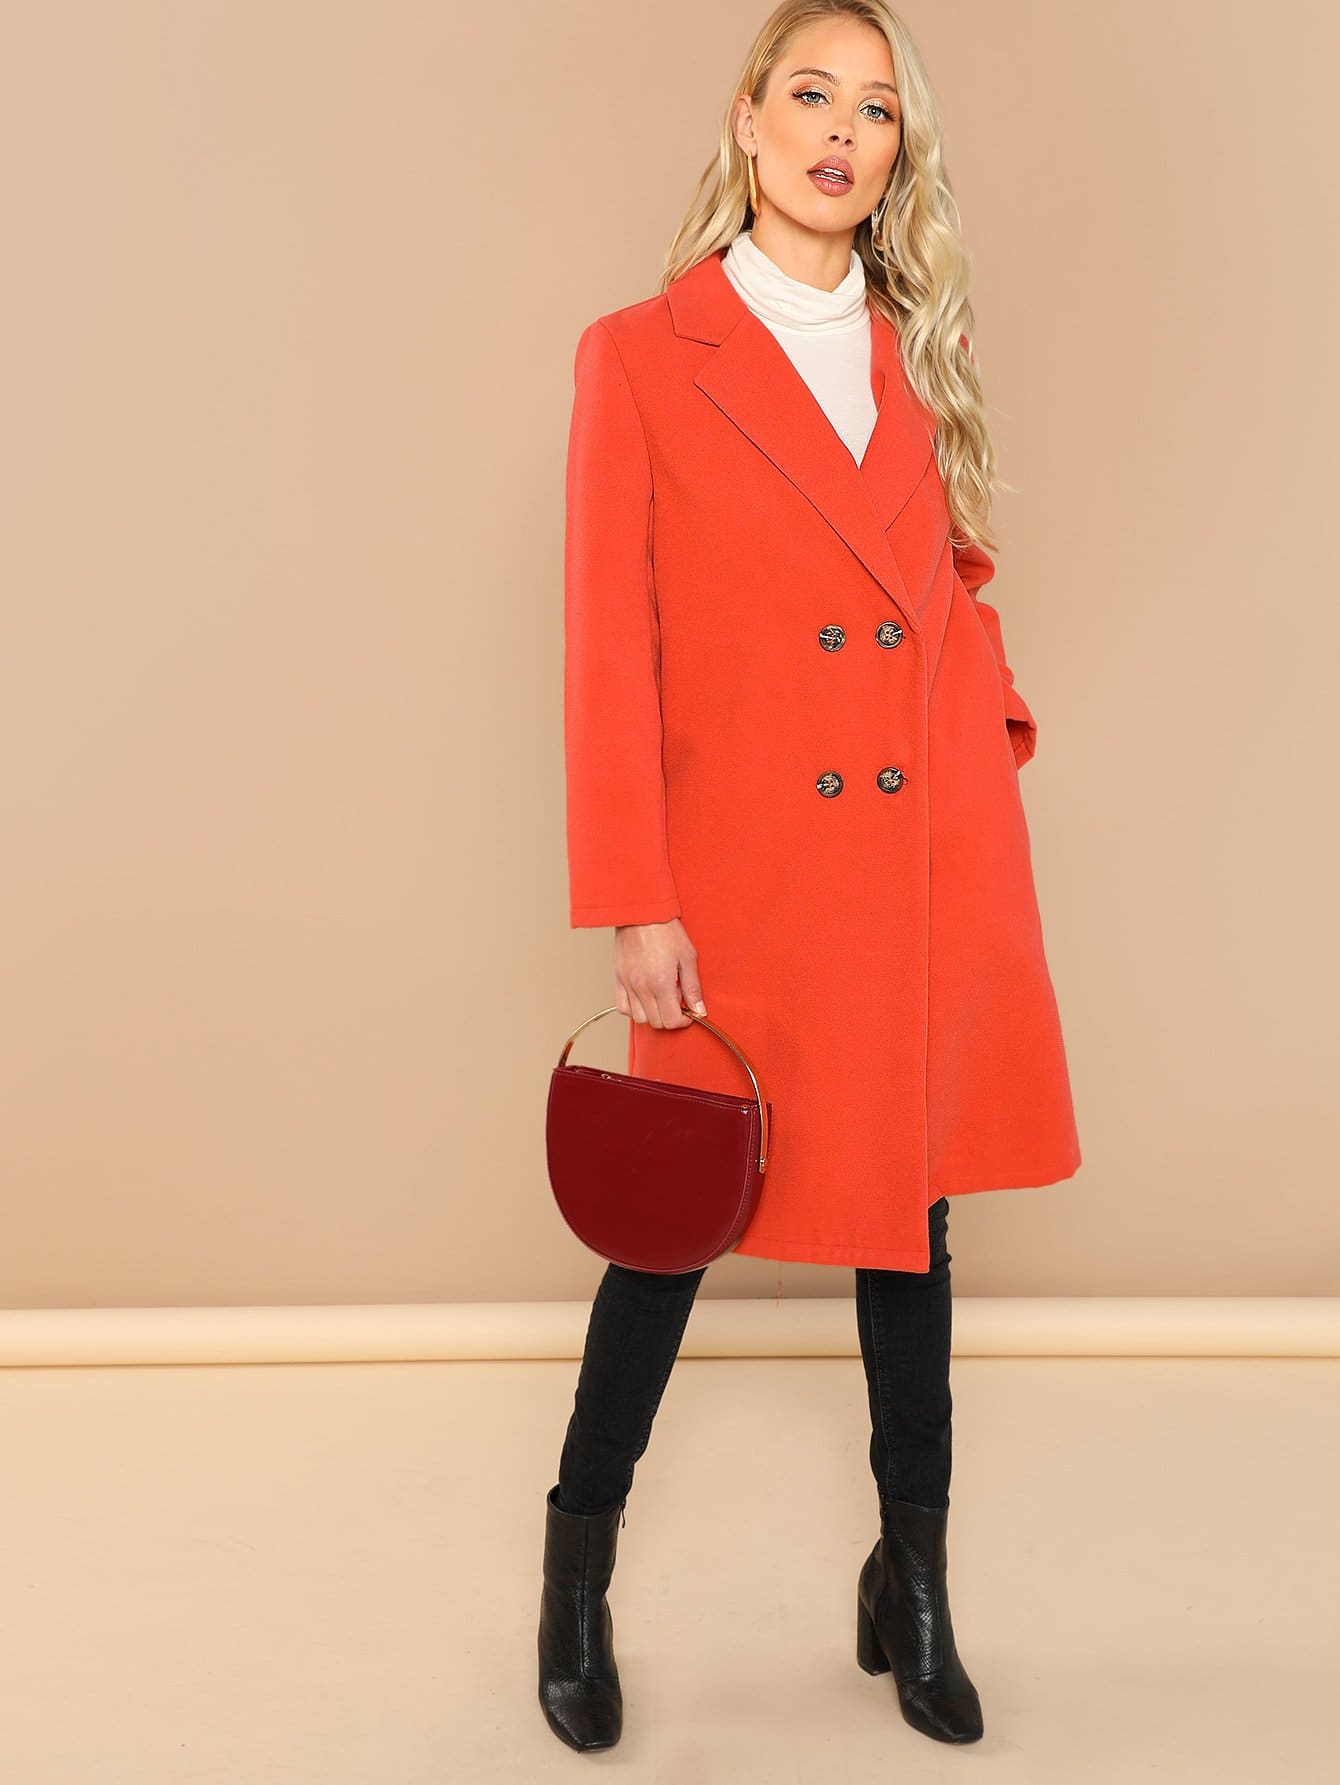 Купить Двубортное пальто с зубчатым вырезом, Allie Leggett, SheIn